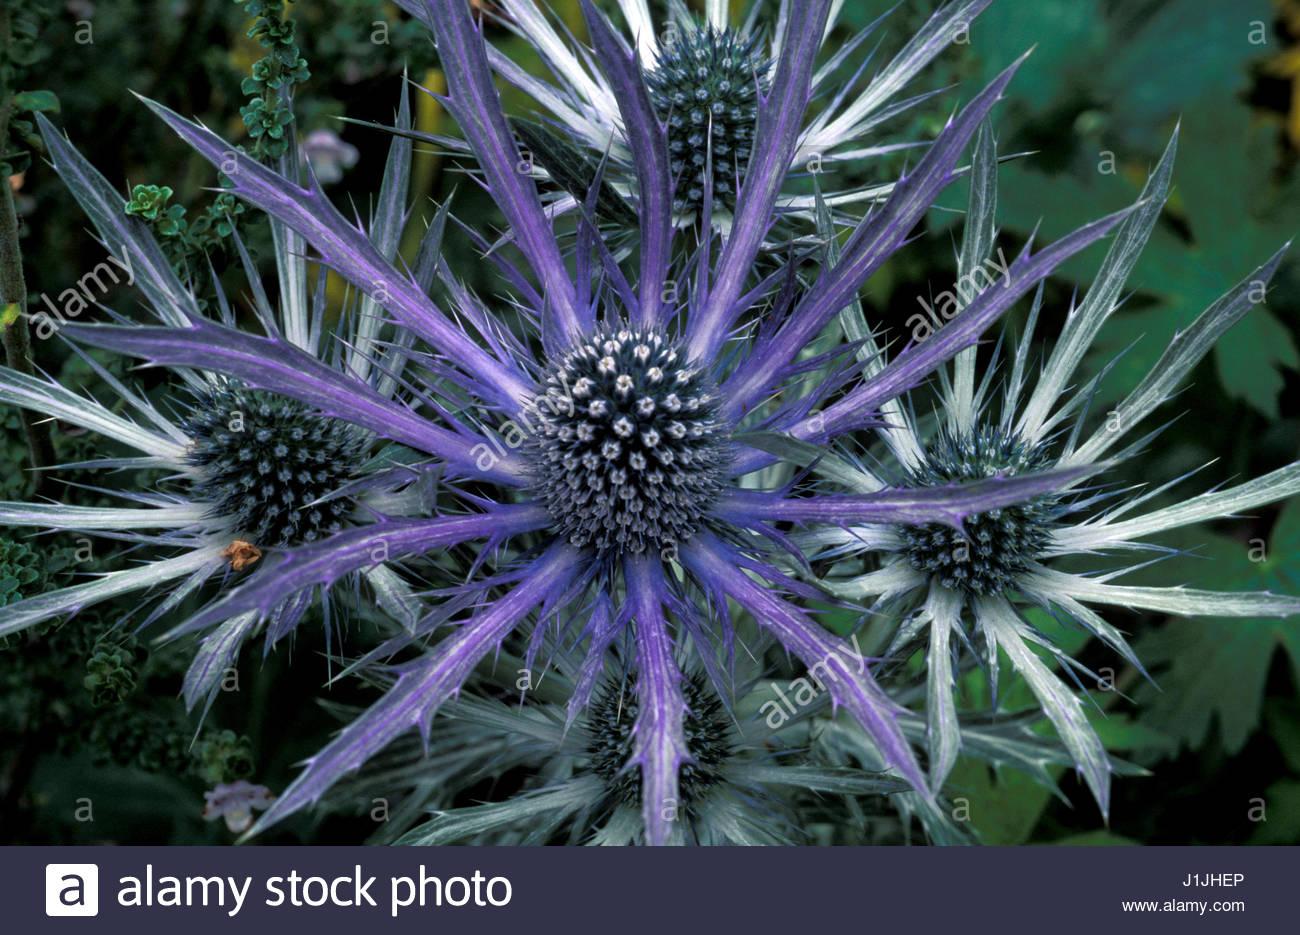 Thistle Like Flower Stock Photos Thistle Like Flower Stock Images